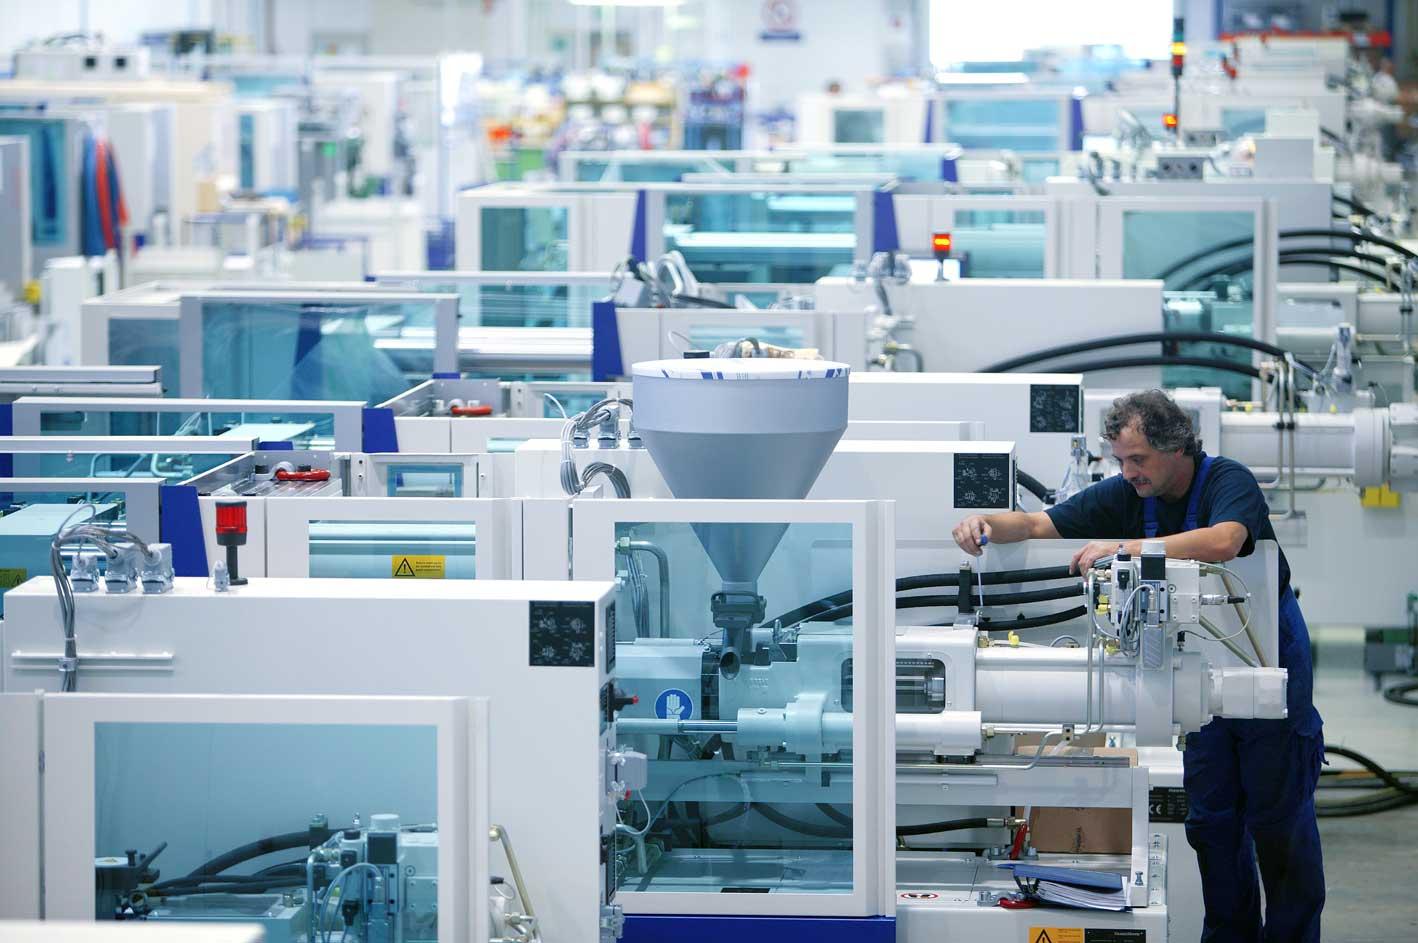 All types of CNC machines, CNC lathes, CNC milling machines purc